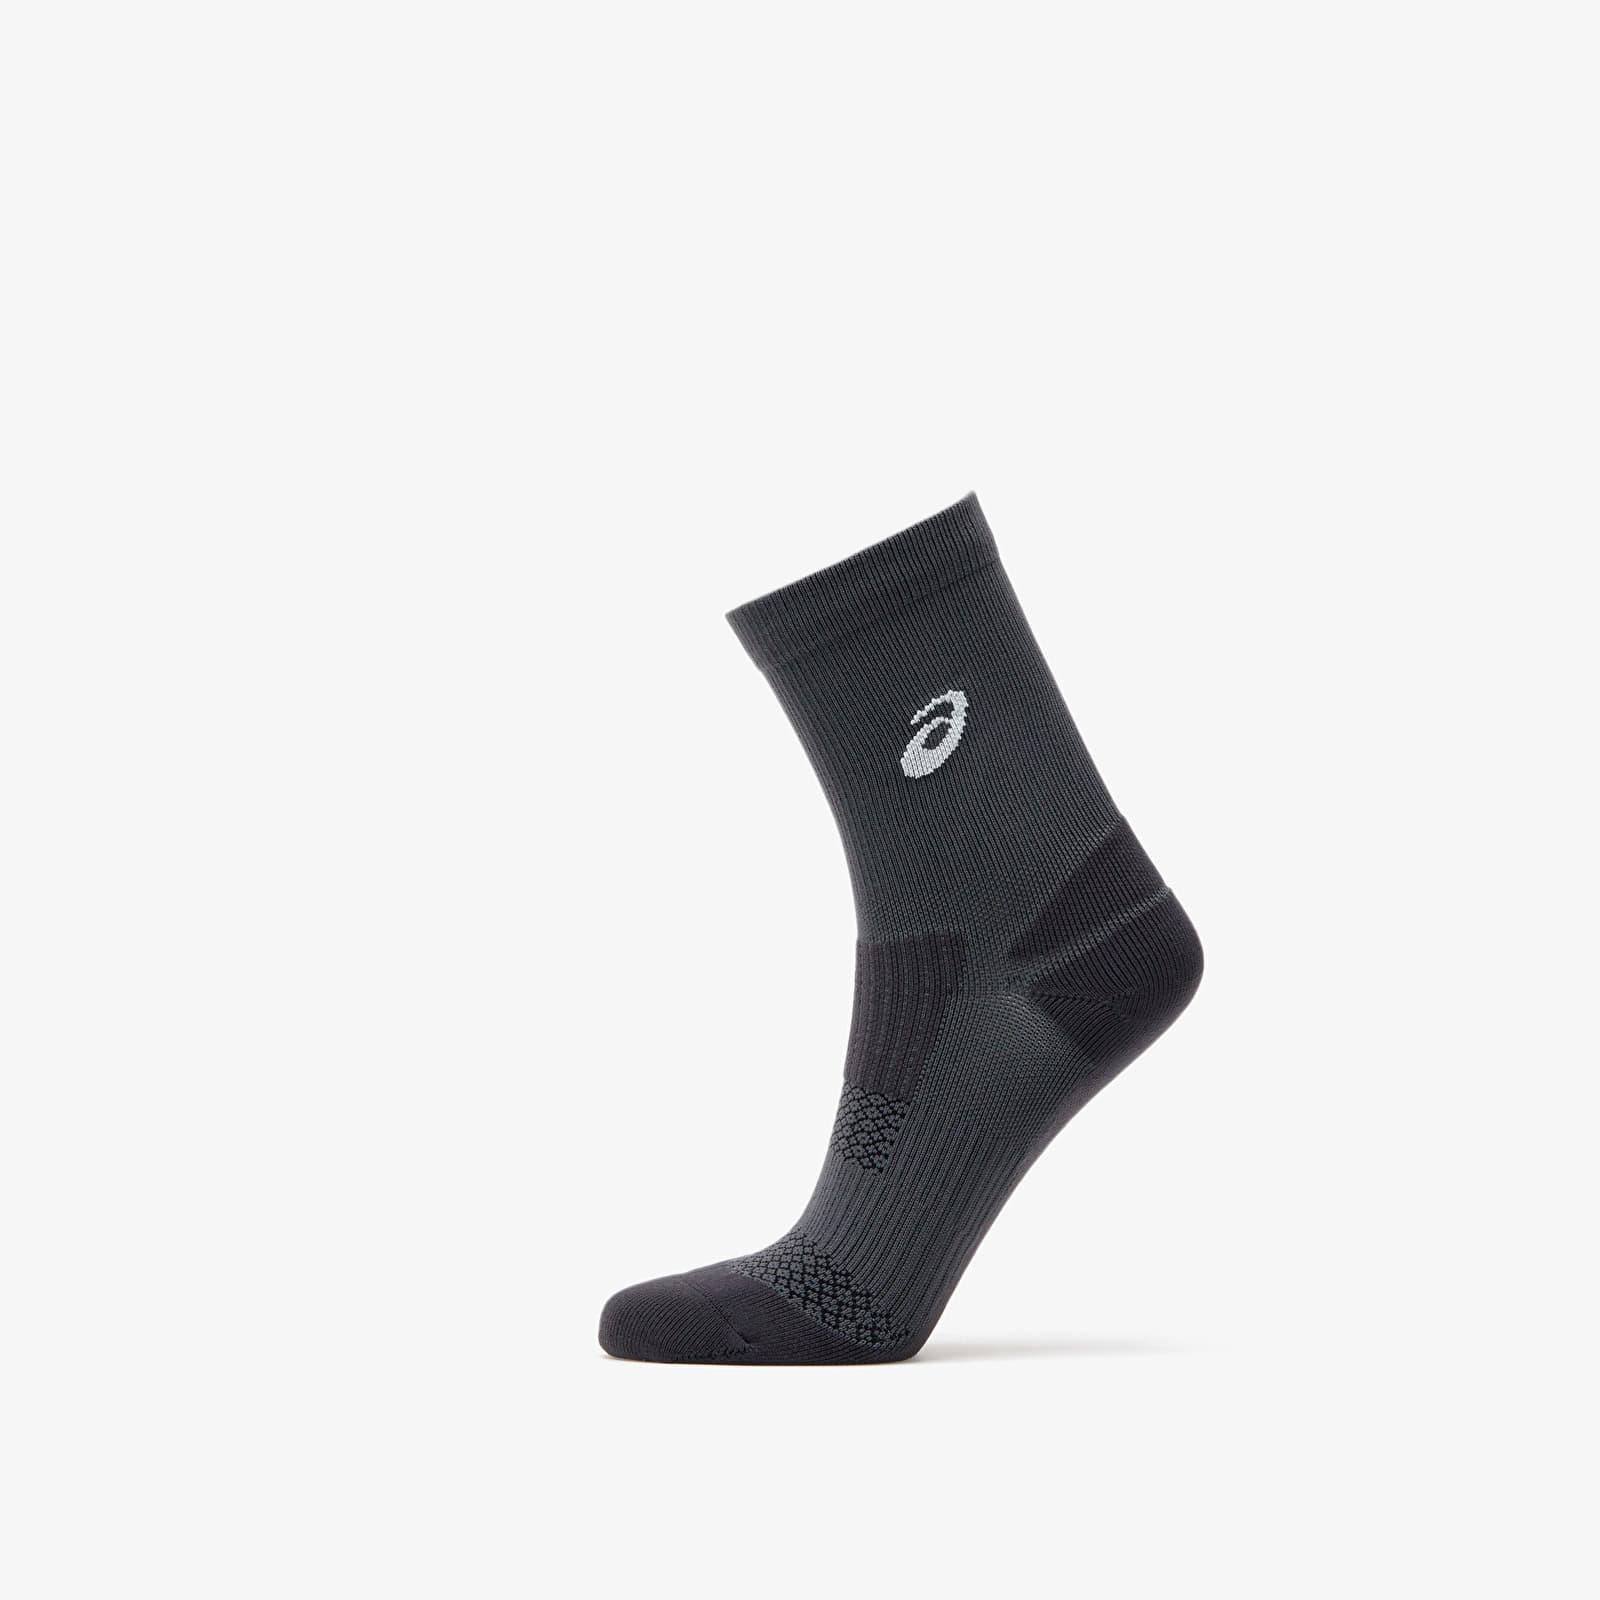 Шкарпетки Asics x Reigning Champ Crew Socks Phantom